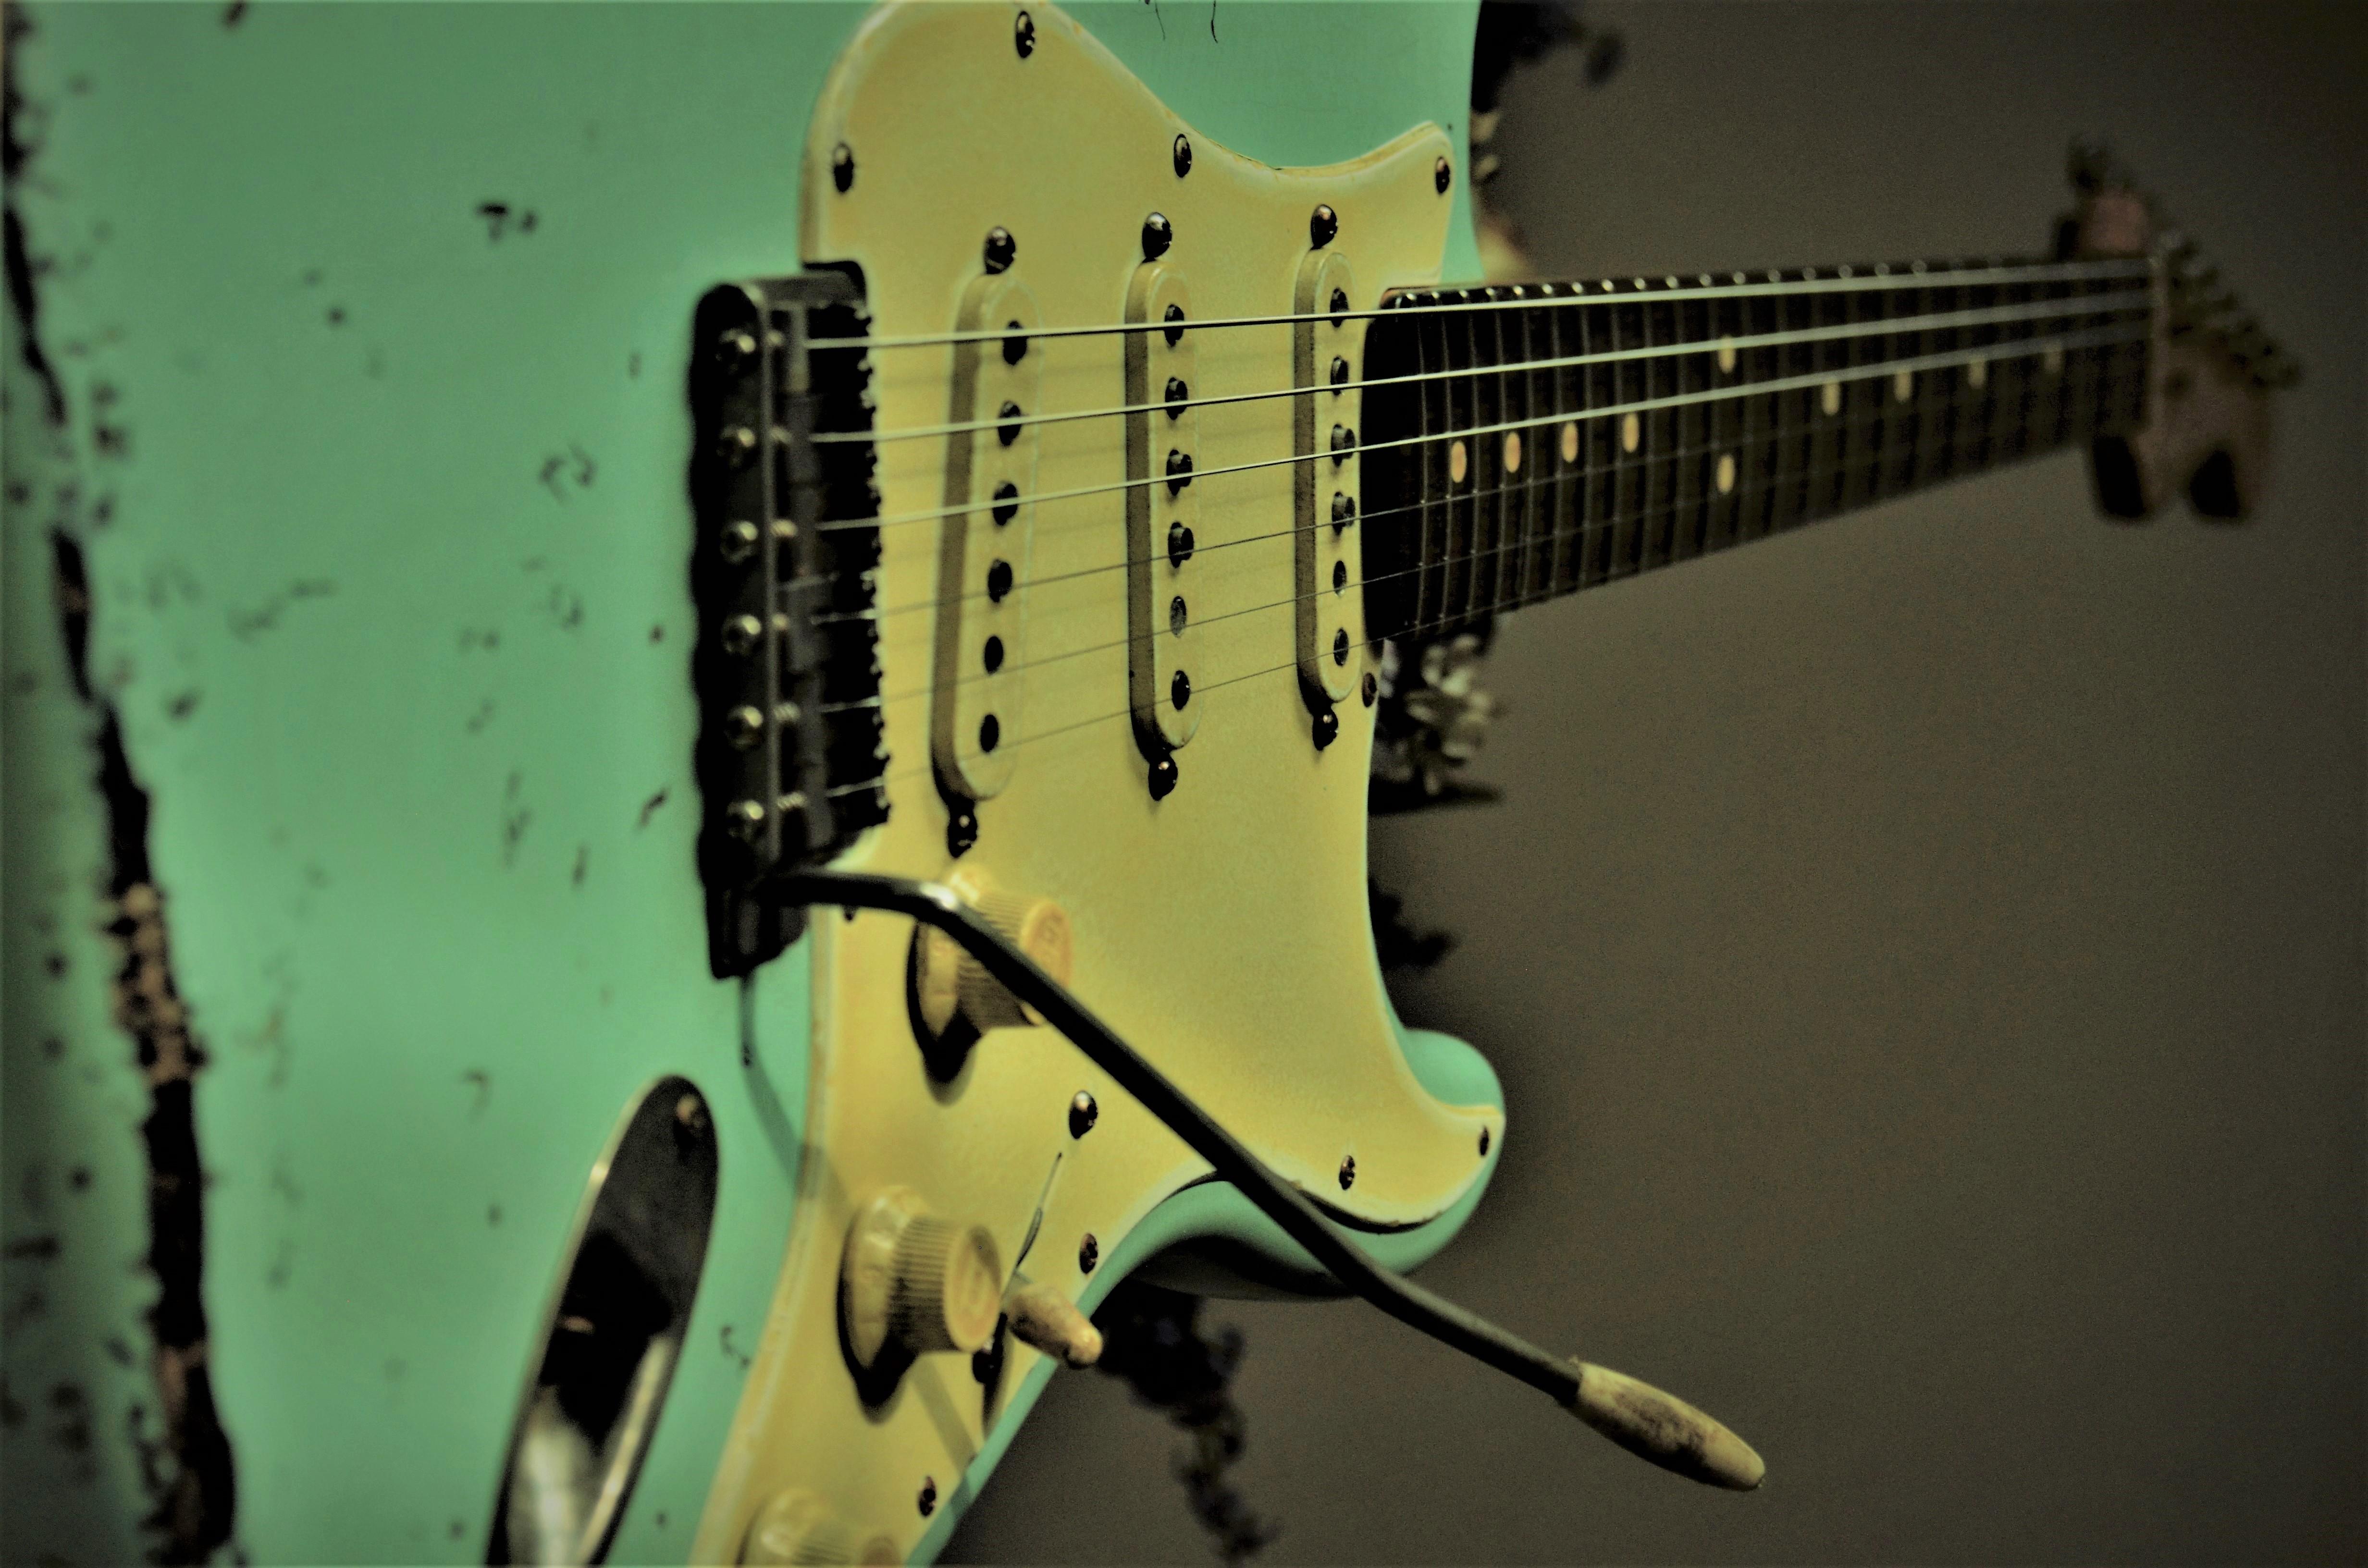 Fender Stratocaster Relic Syrf Green Guitarwacky.com